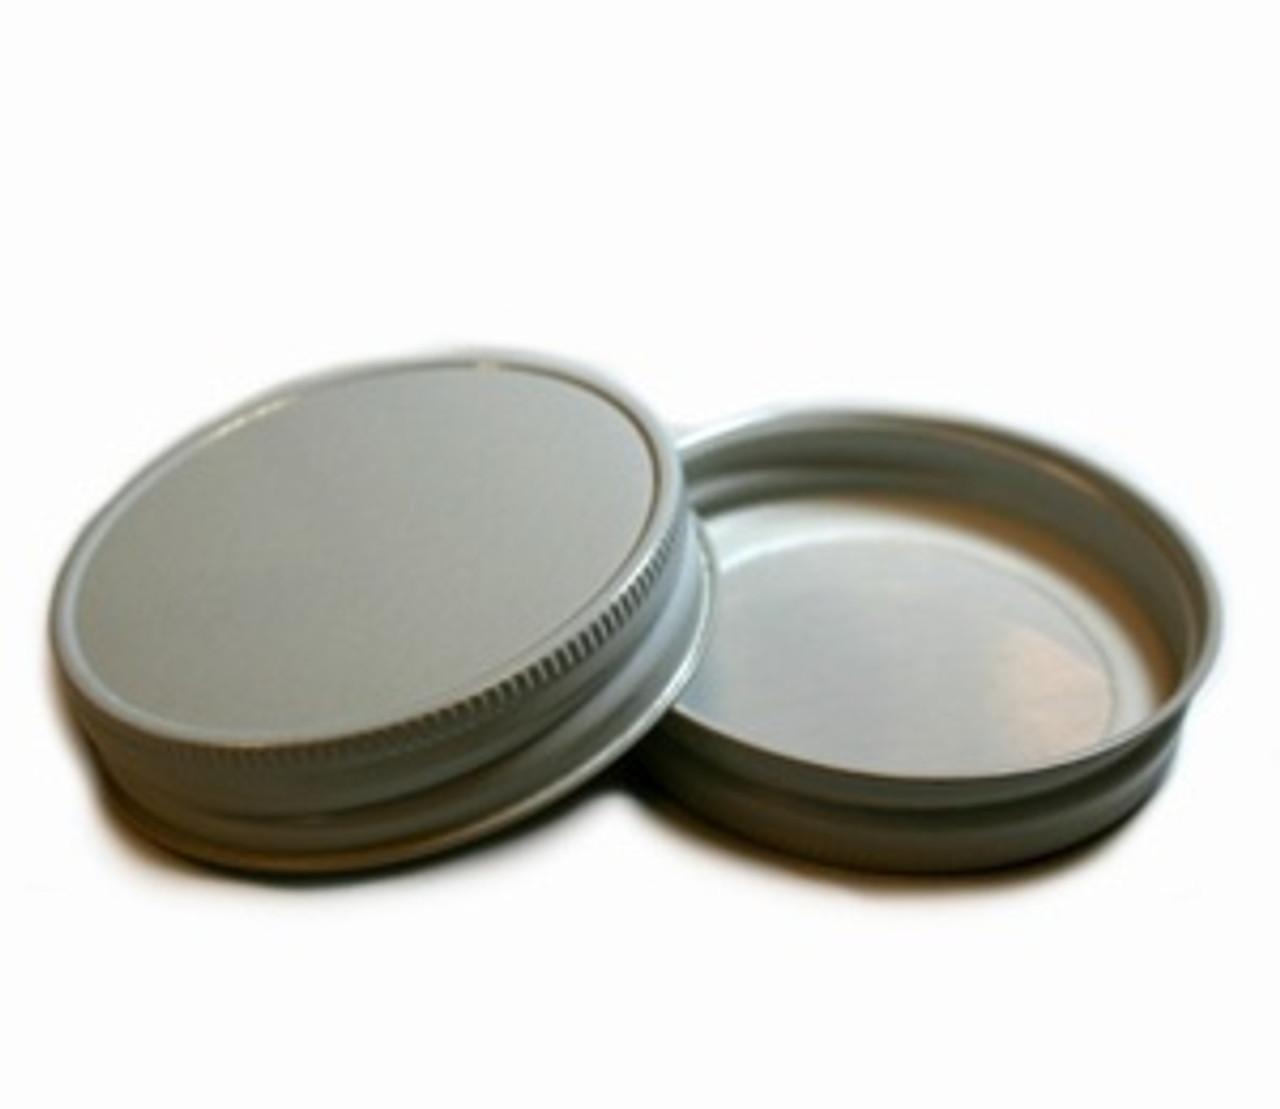 Plastisol Mason Jar Lid - White